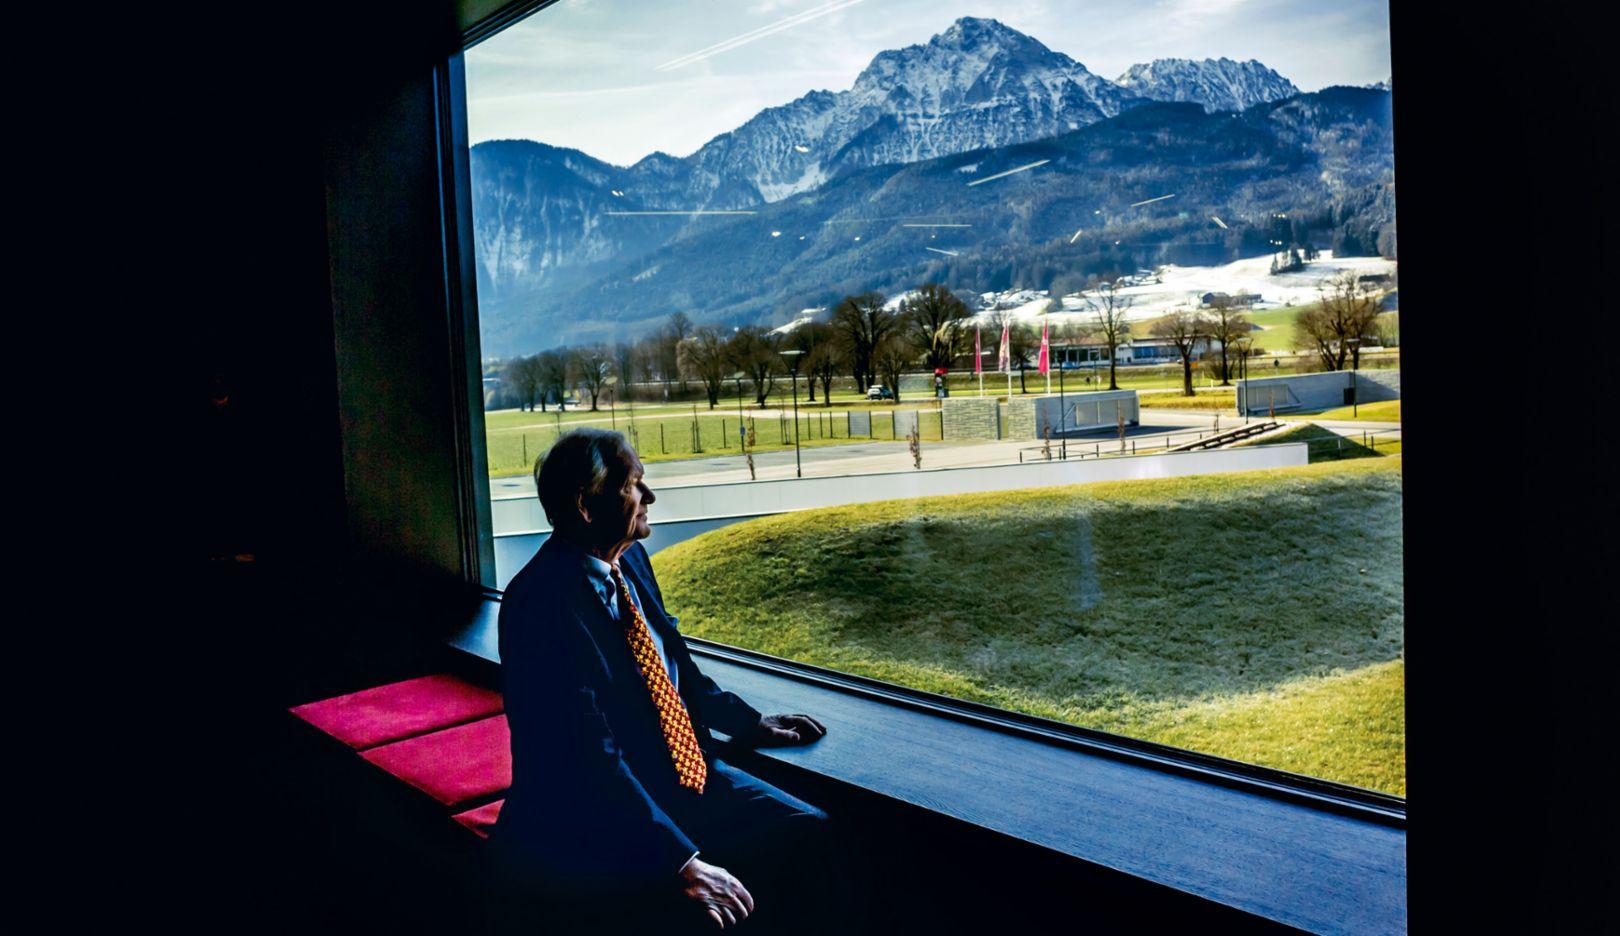 Hans-Peter Porsche, Mitglied des Aufsichtsrates der Porsche AG und der Porsche Automobil Holding SE, Berchtesgadener Land, 2016, Porsche AG